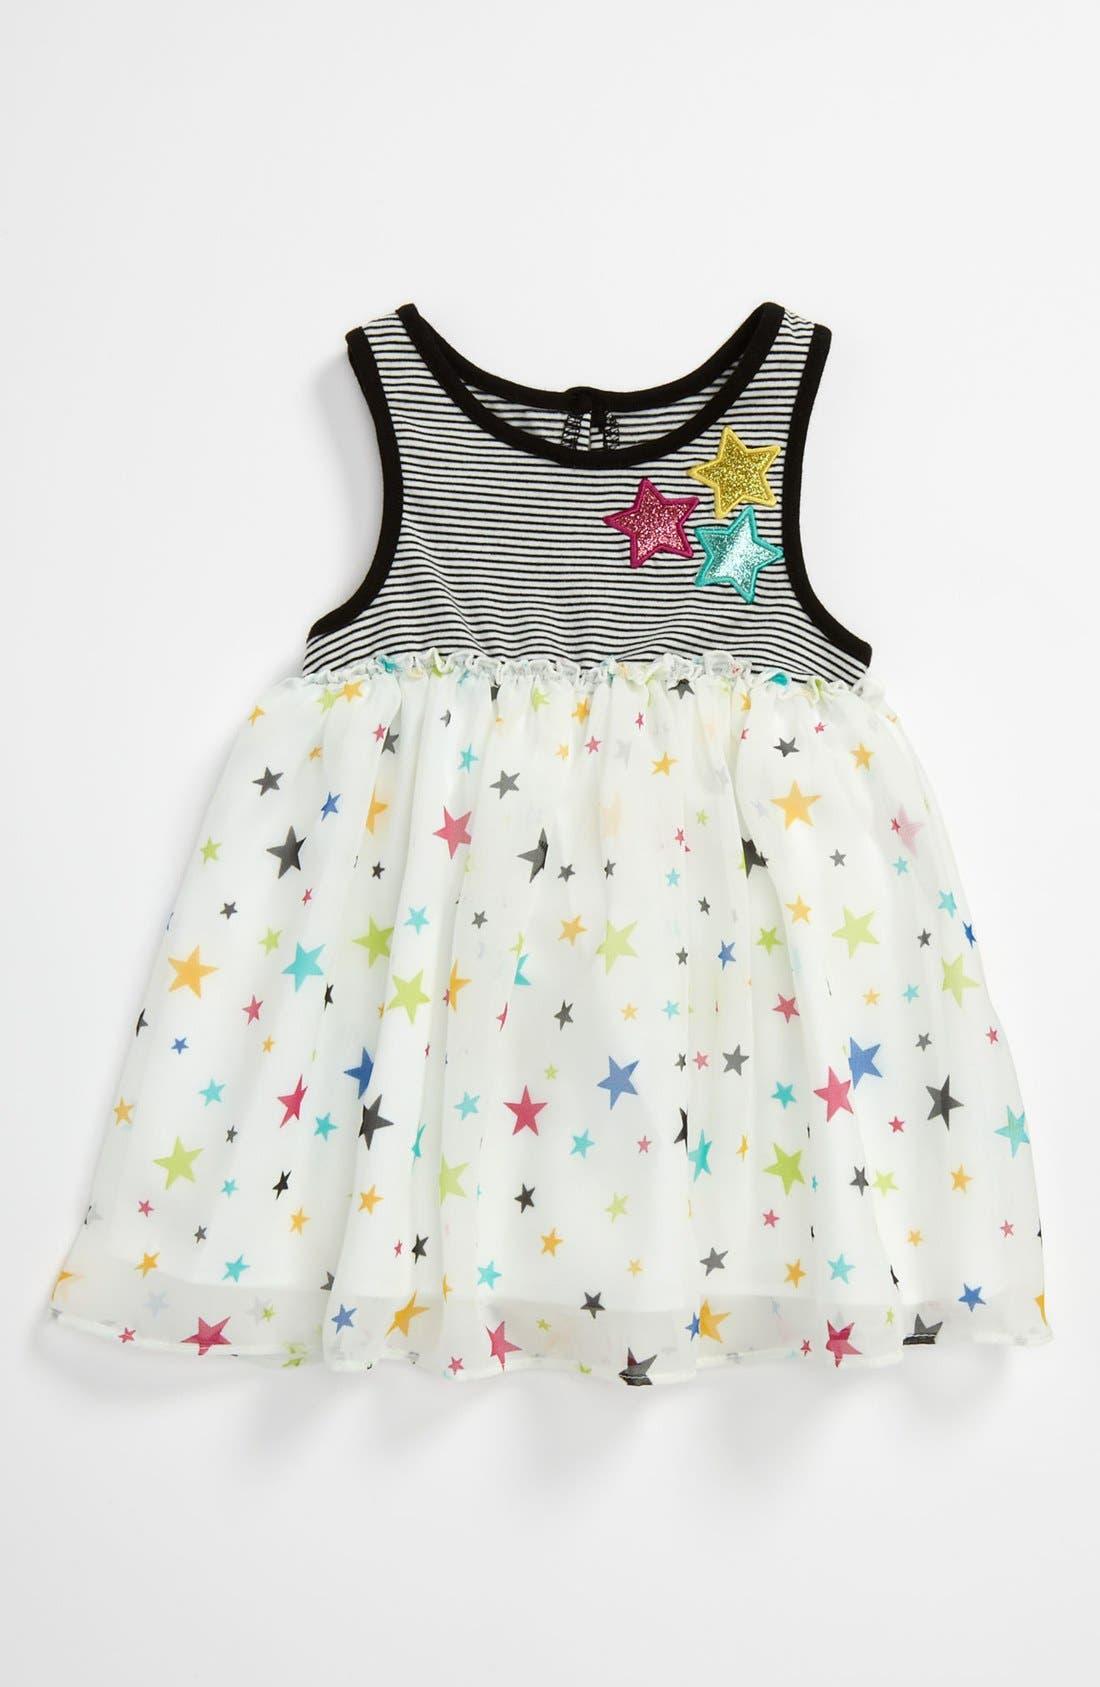 Main Image - Pippa & Julie 'Star' Dress (Toddler)